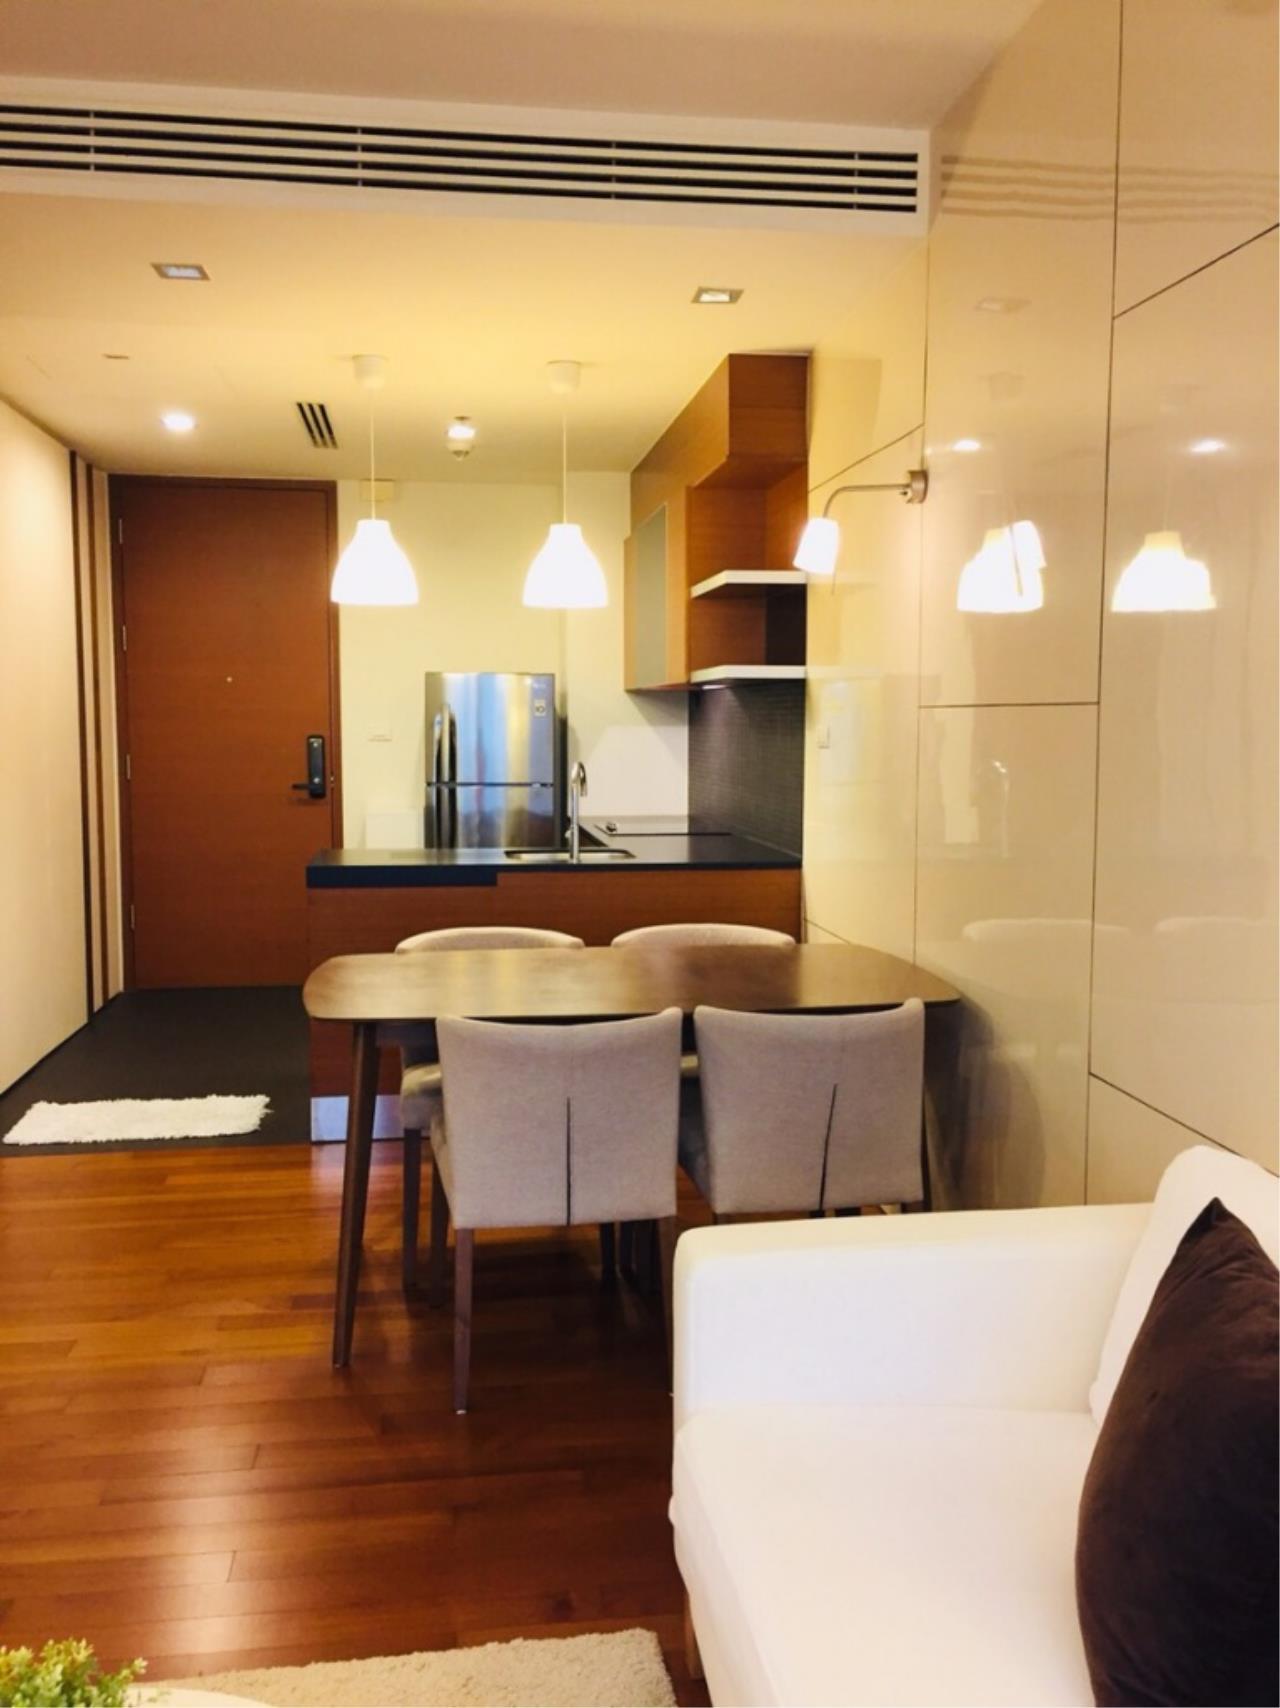 Century21 Skylux Agency's Ashton Morph 38 / Condo For Rent / 2 Bedroom / 75 SQM / BTS Thong Lo / Bangkok 7